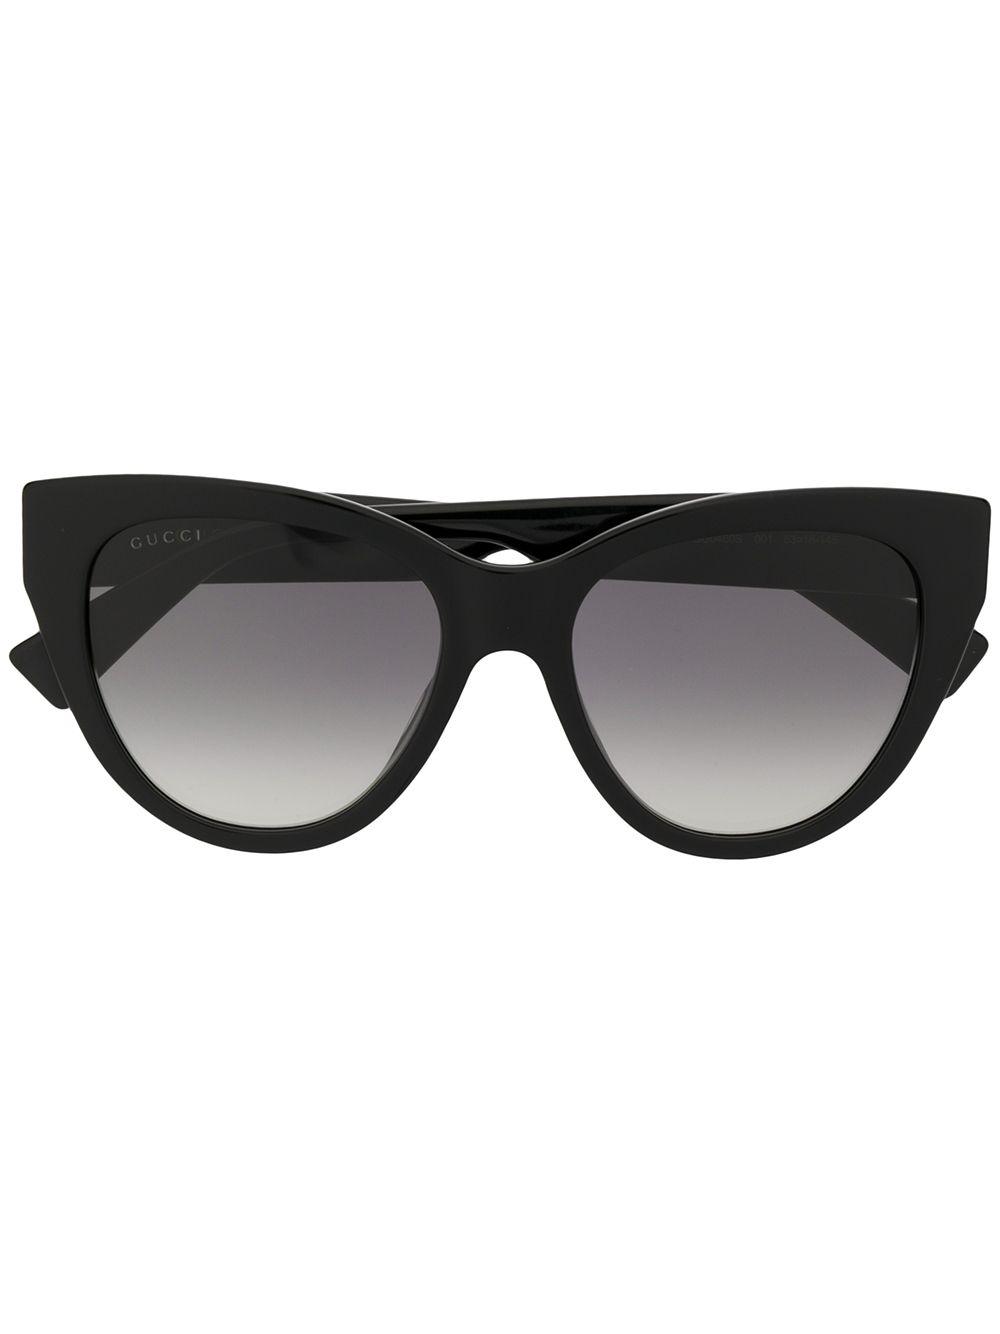 ae7815ea02b Gucci Eyewear Cat Eye Sunglasses - Black